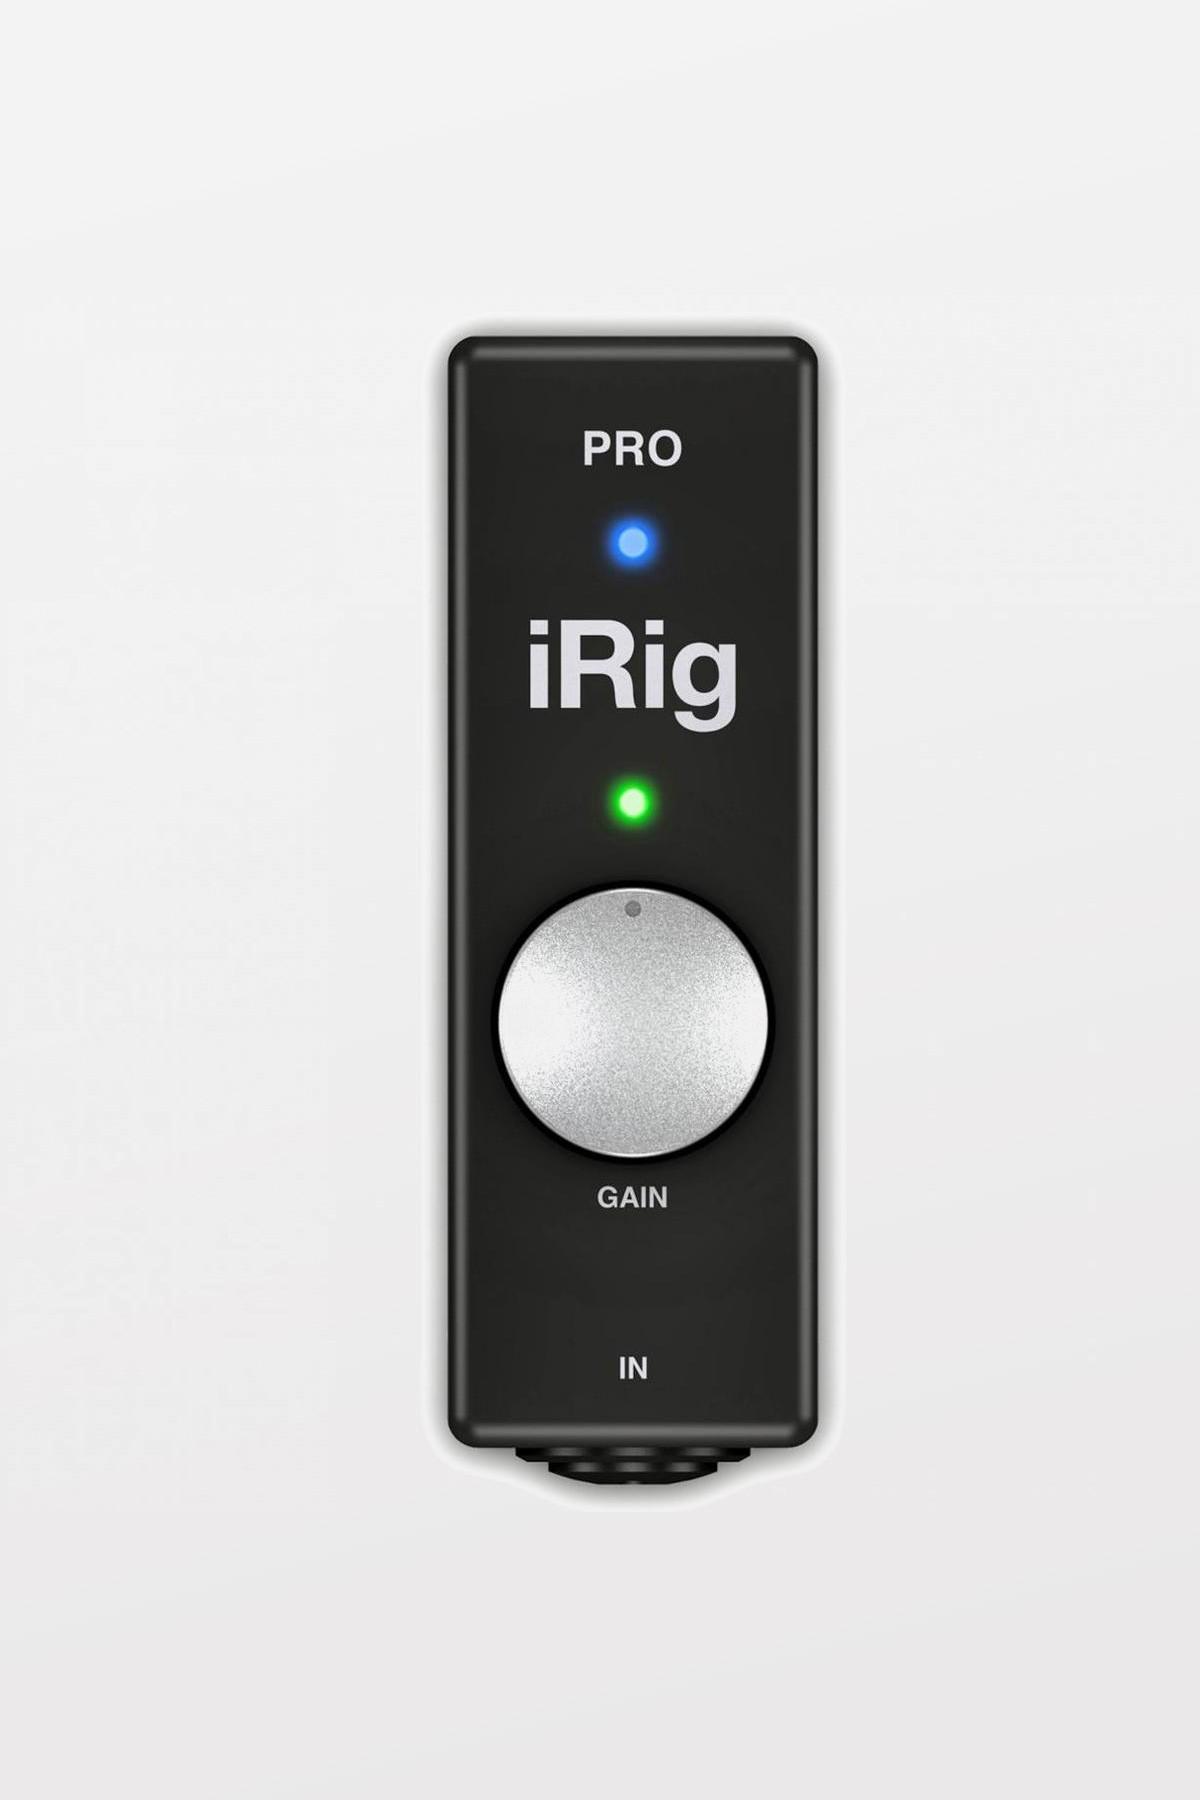 iRig PRO - Universal Audio/Midi interface for iOS and Mac